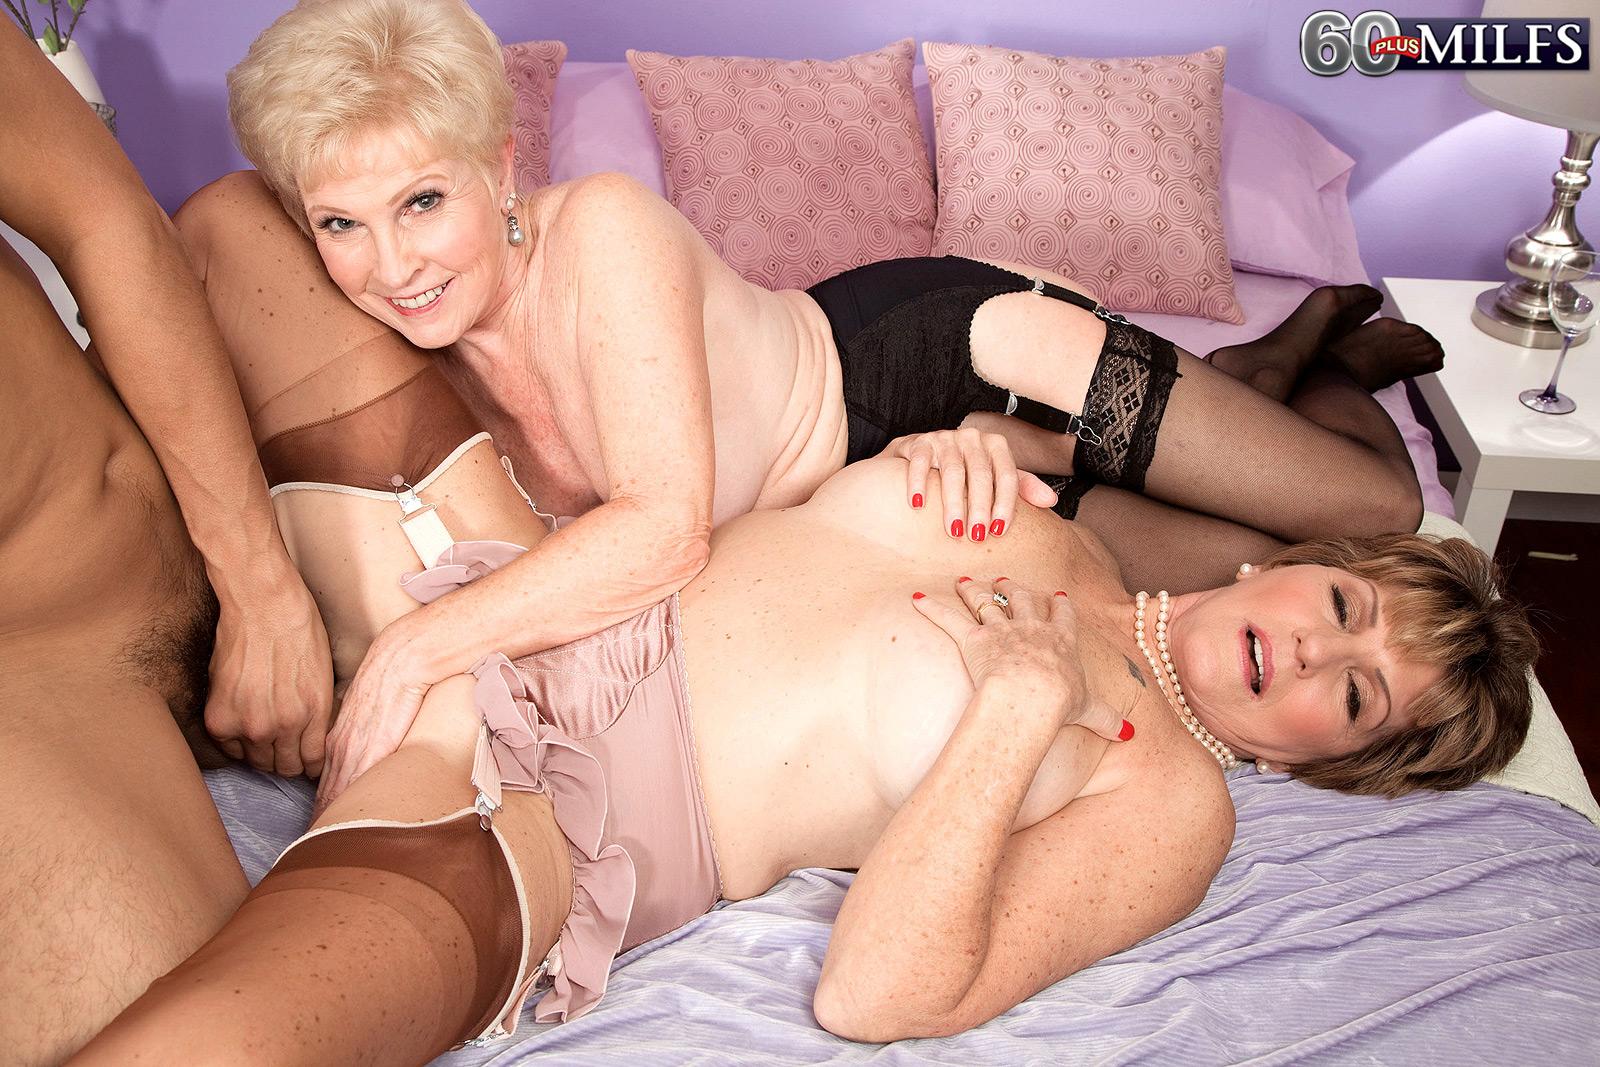 Adult threesome free video 50 plus Teledildonics growing